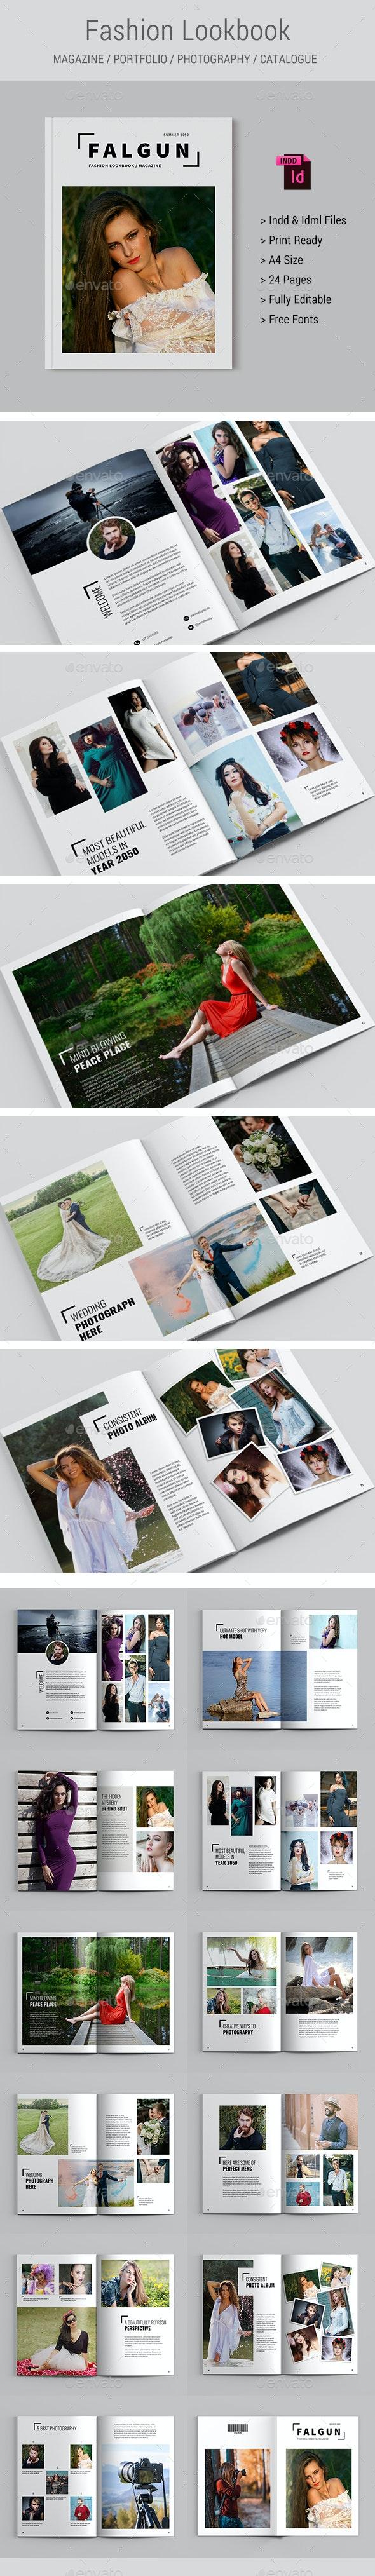 Fashion Lookbook / Magazine - Magazines Print Templates